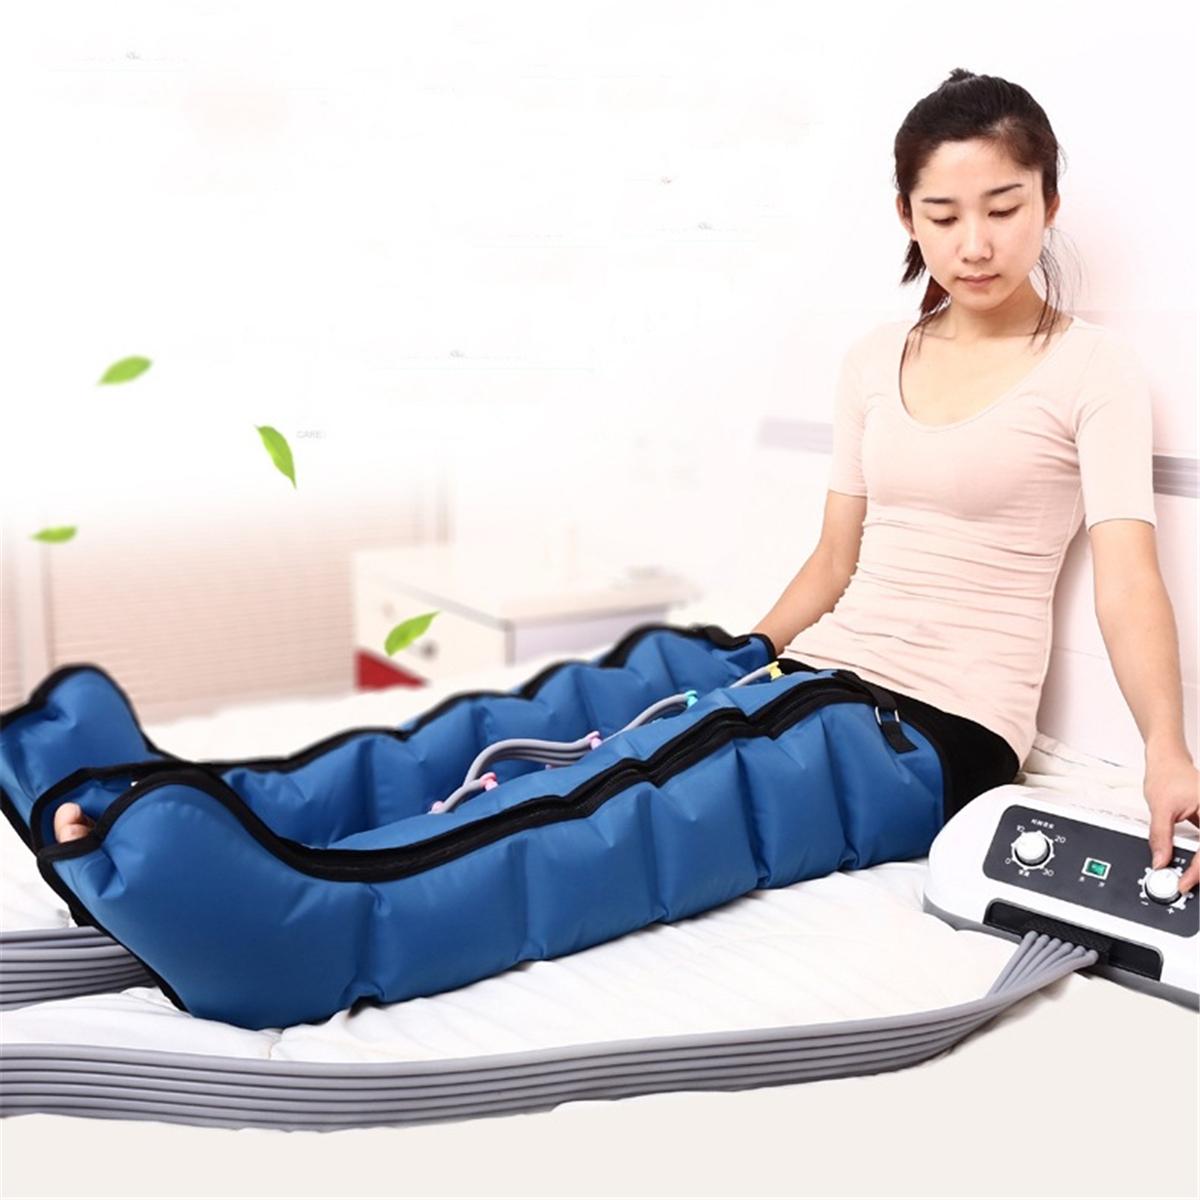 6 Air Chambers Leg Compression Massager Arm Waist Calf Relaxed Circulation Pressure Massage Electric Massager